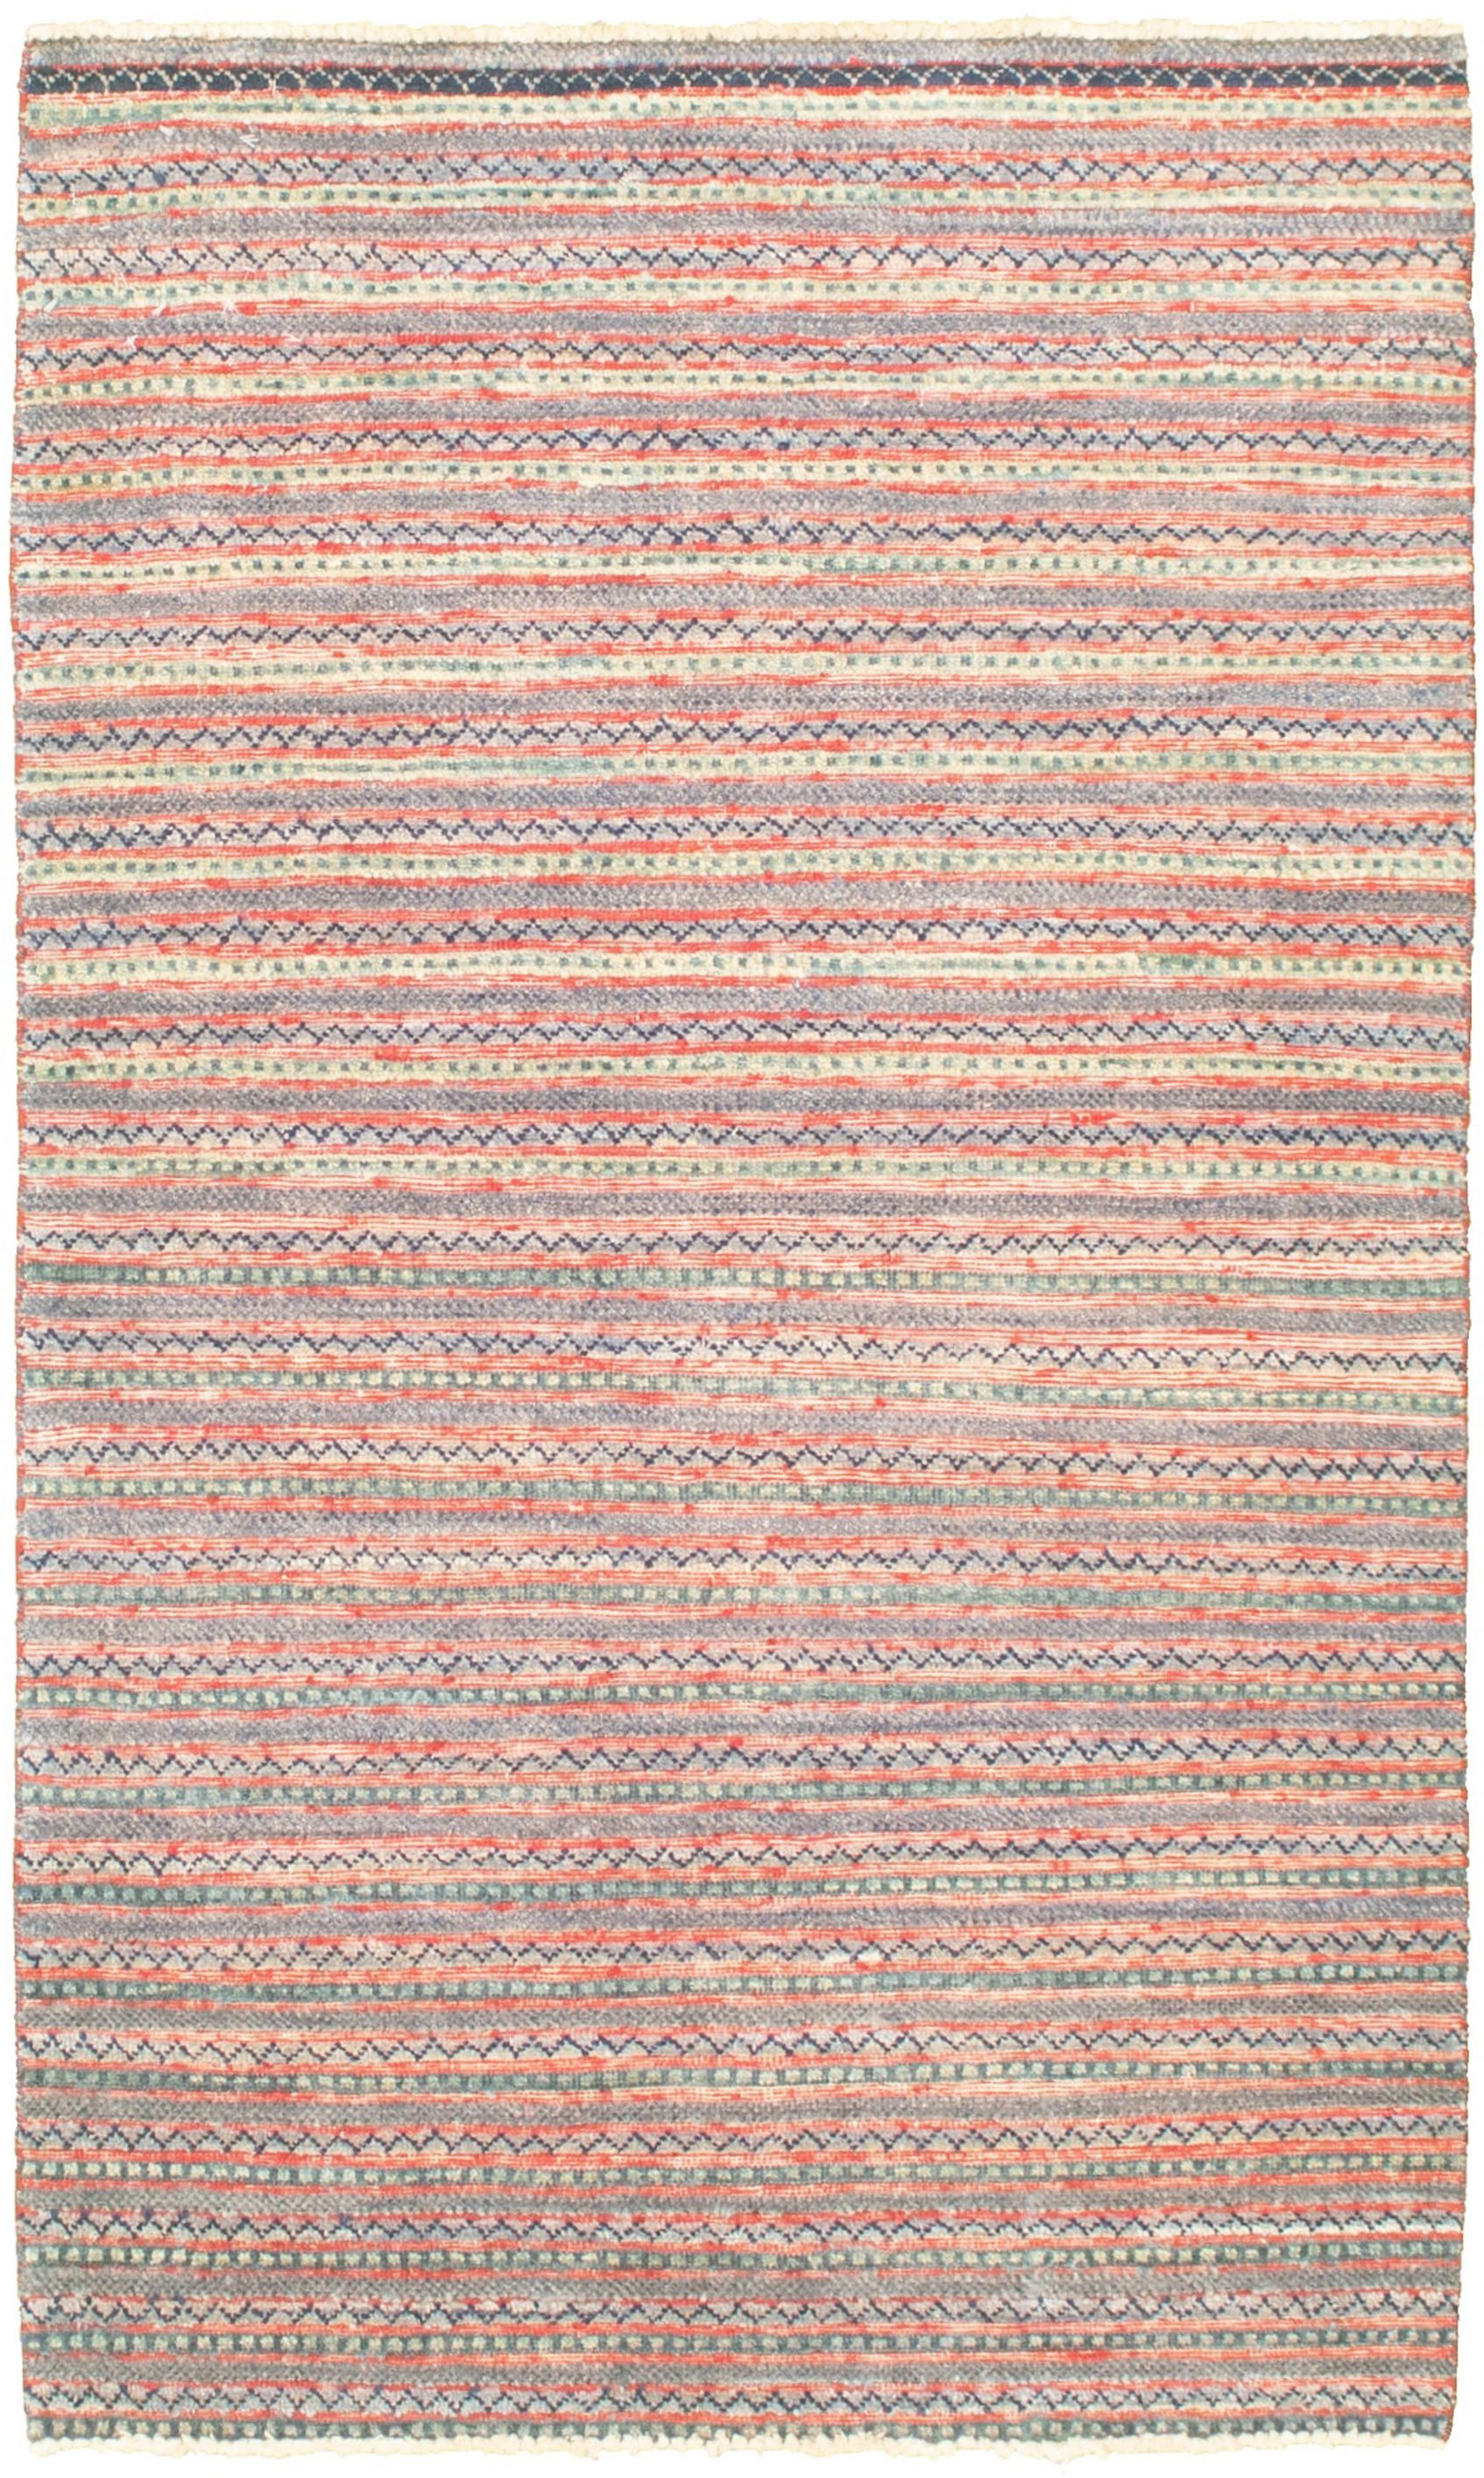 "Hand-knotted Peshawar Ziegler Slate Blue Wool Rug 3'1"" x 5'3"" Size: 3'1"" x 5'3"""